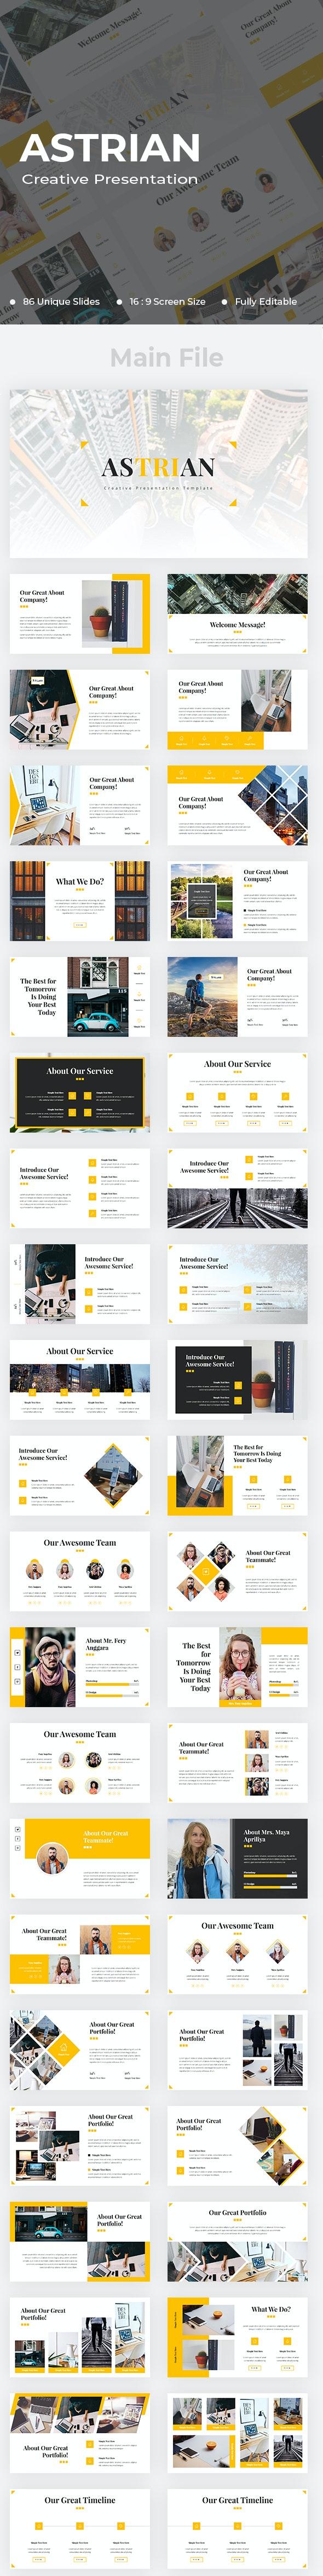 Astrian Creative Google Slides - Google Slides Presentation Templates